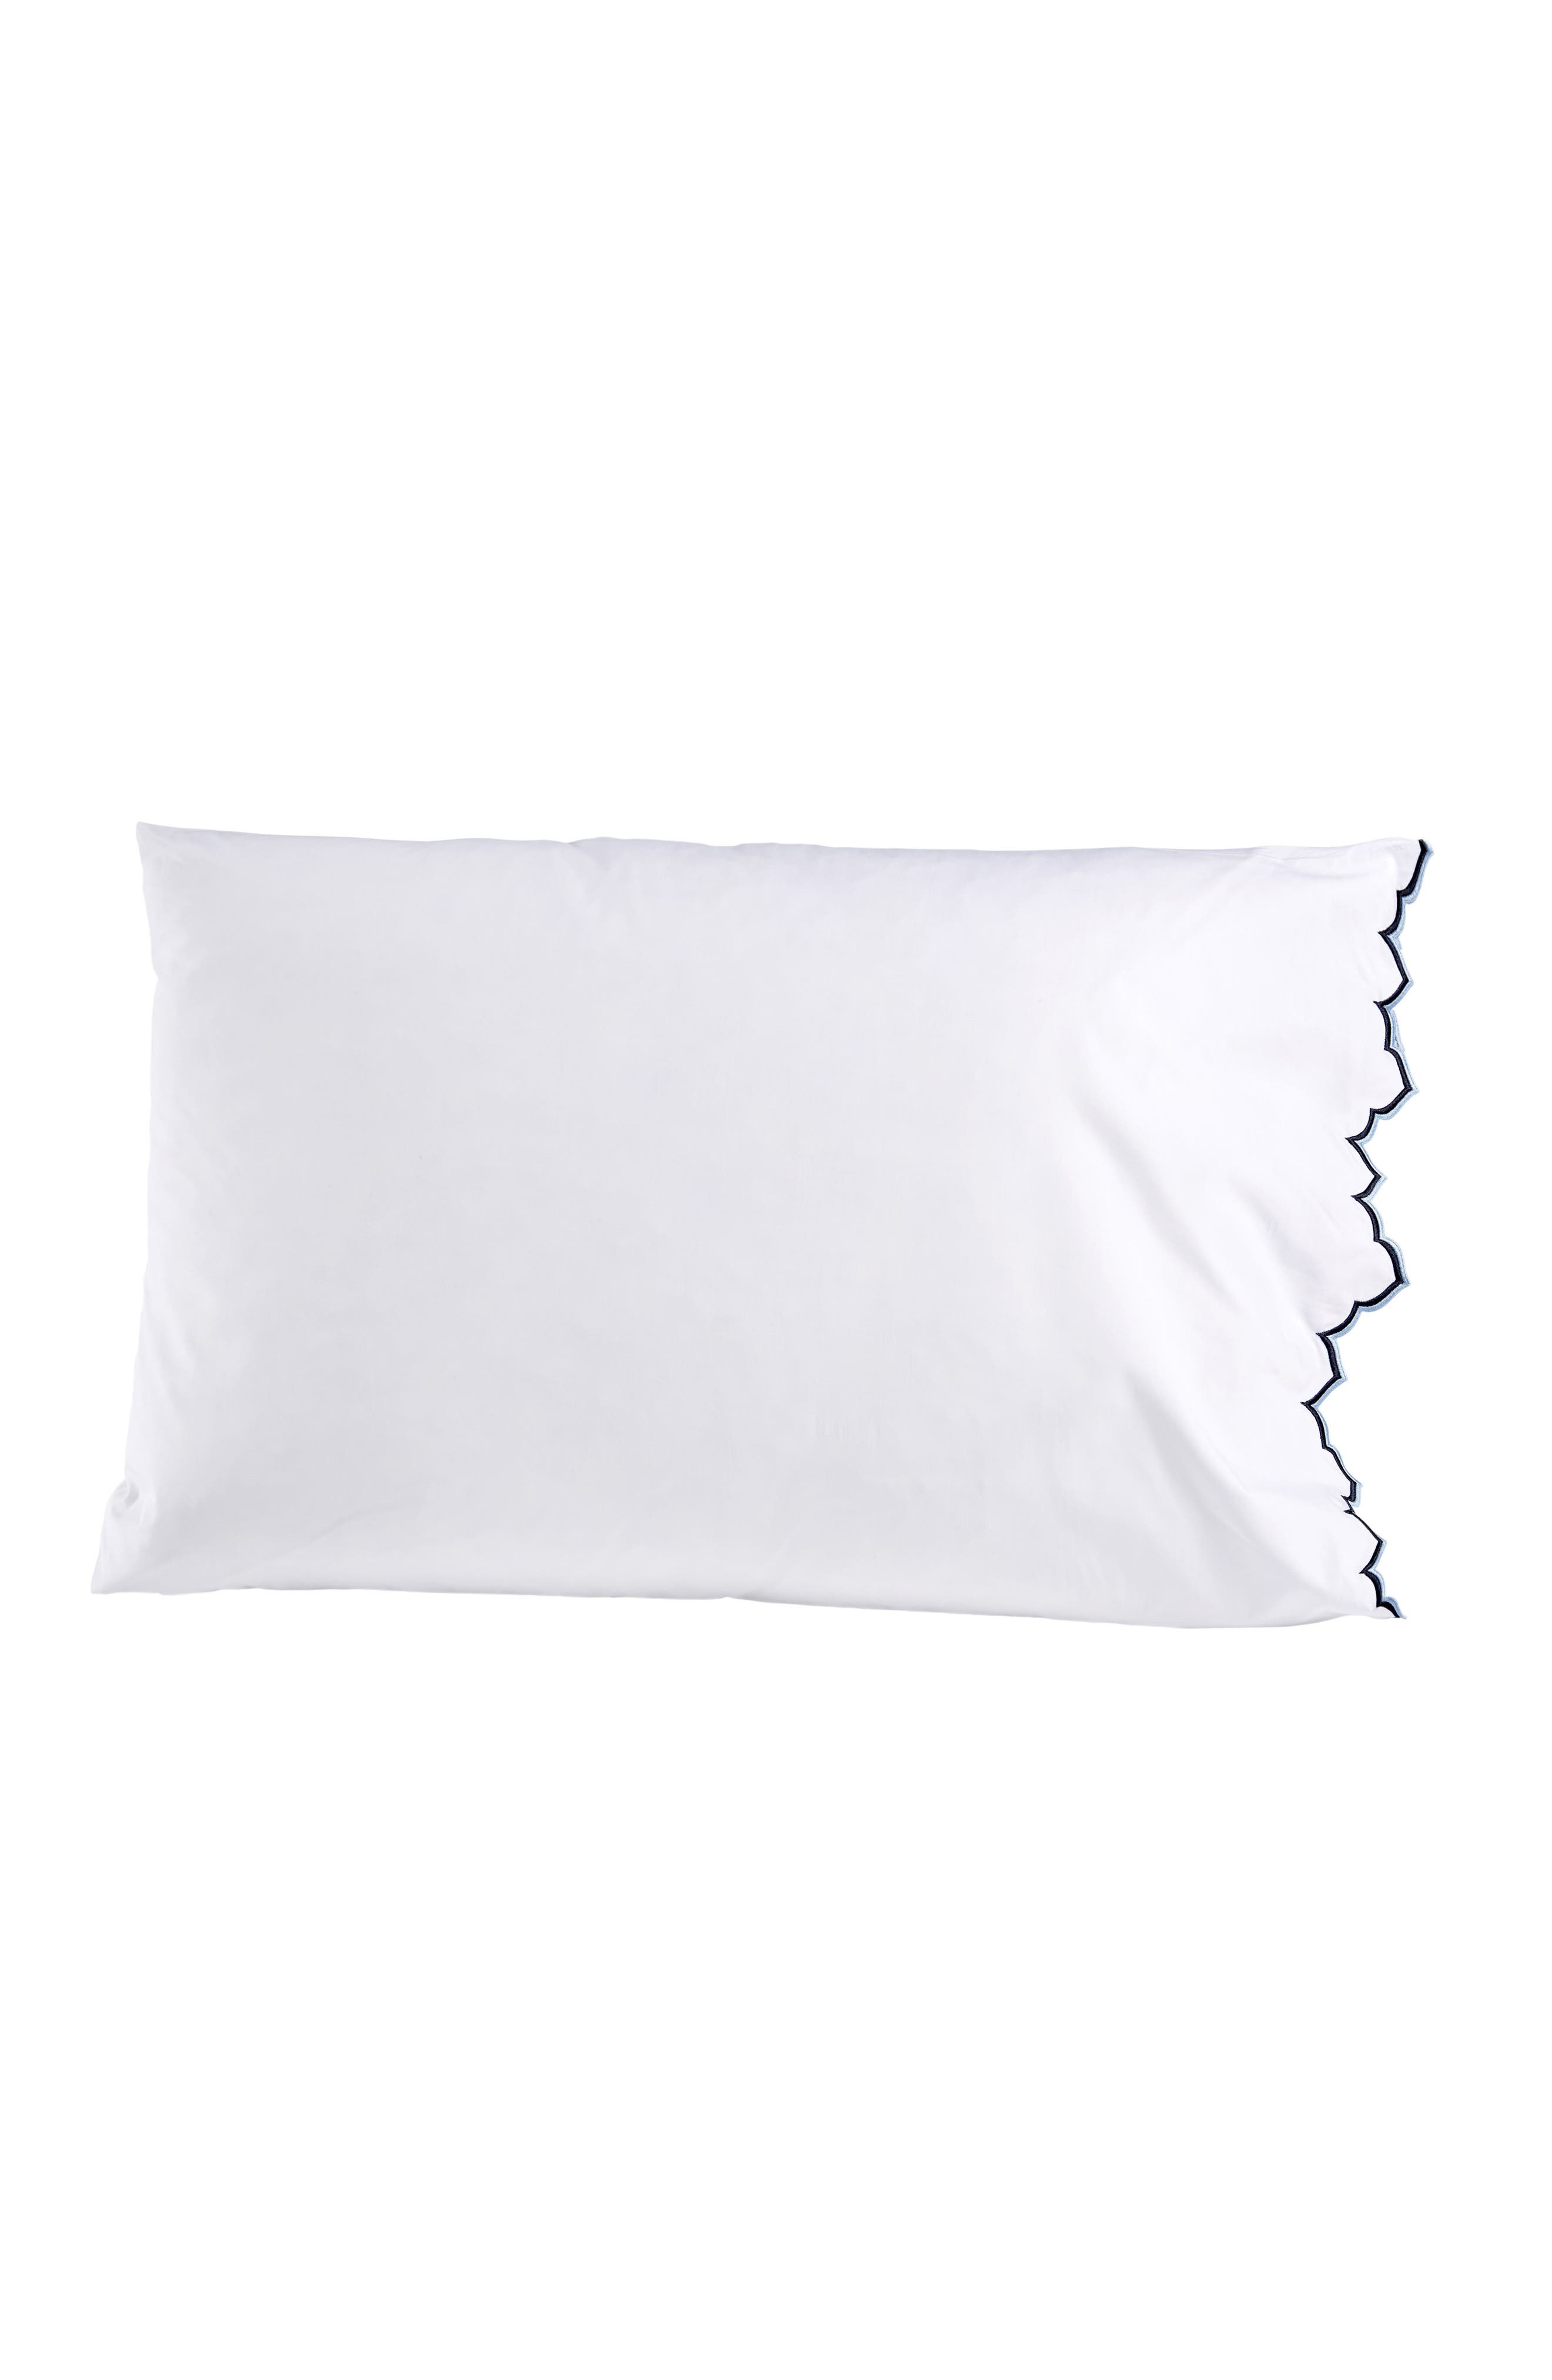 John Robshaw Sakuna 300 Thread Count Pillowcases